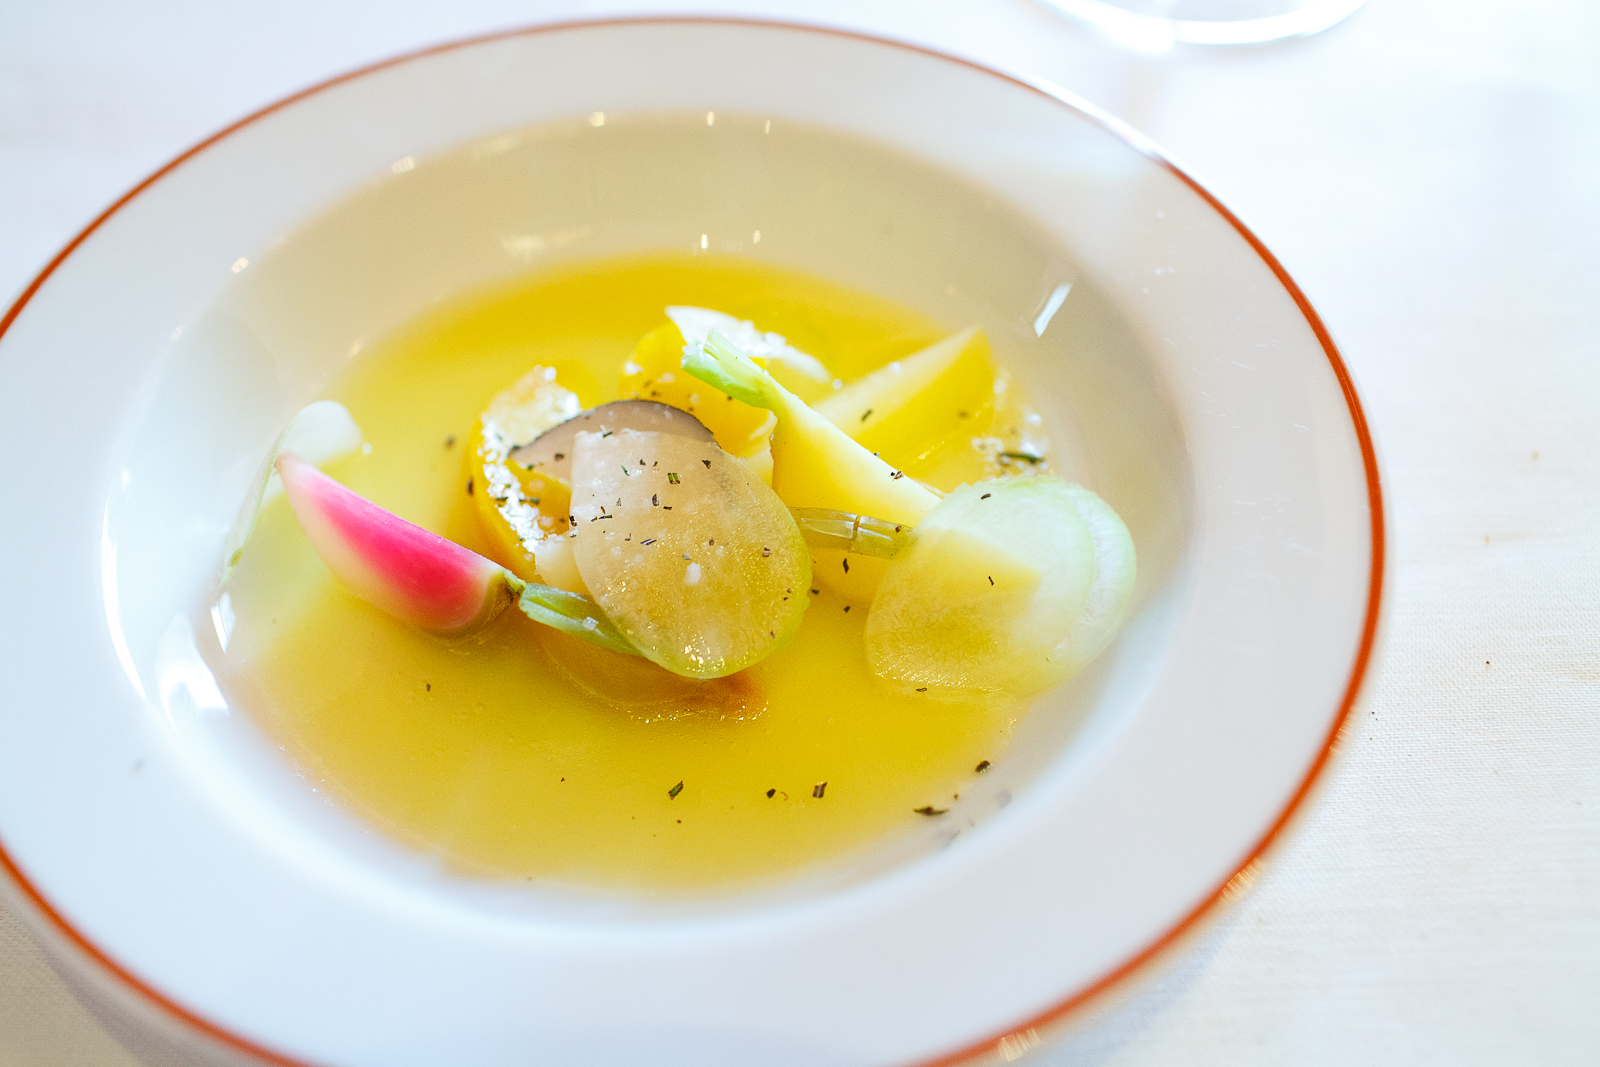 Squash and turnip